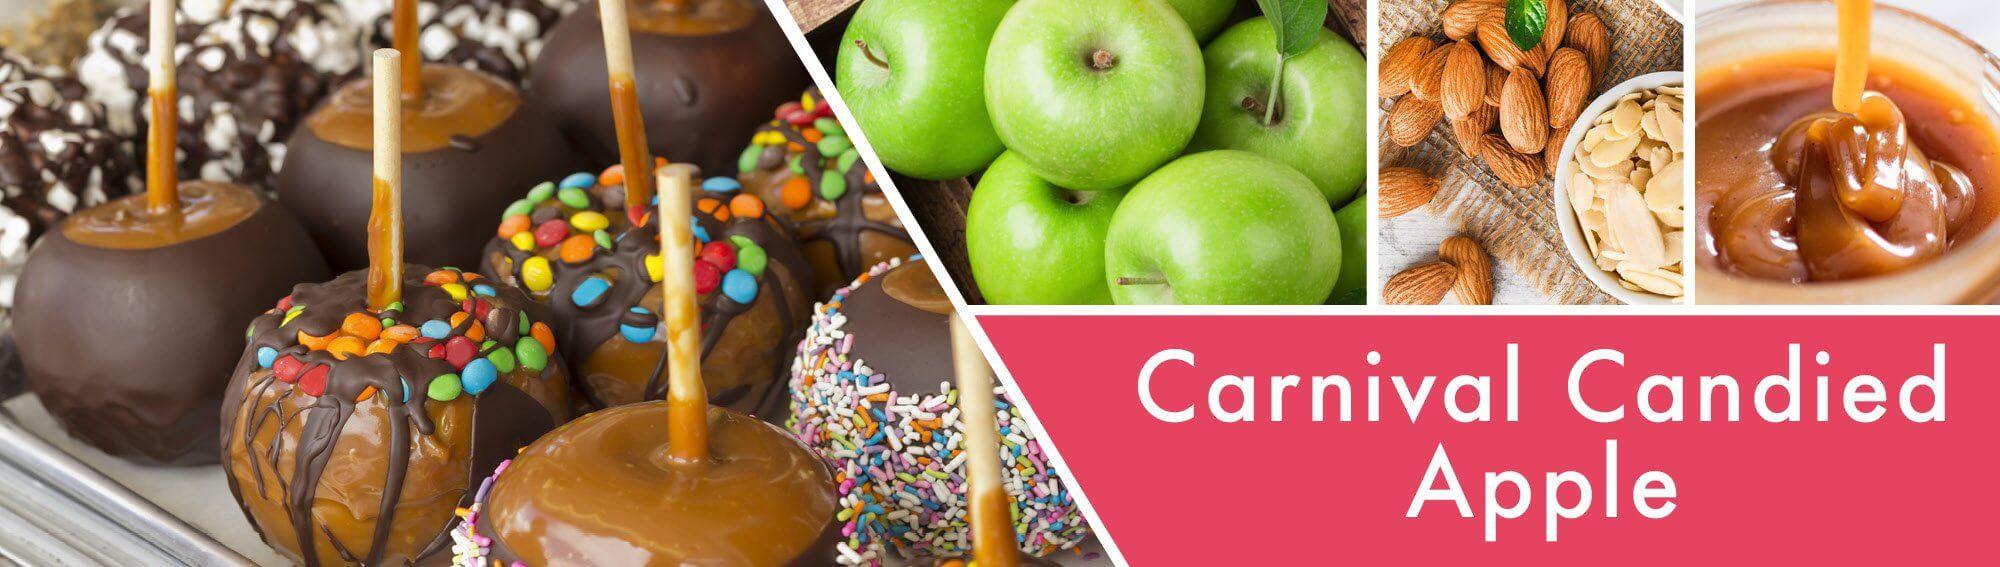 goose-creek-candlez-carnival-candied-apple-wachsmelt-59g_2h2bySydRz2q3U